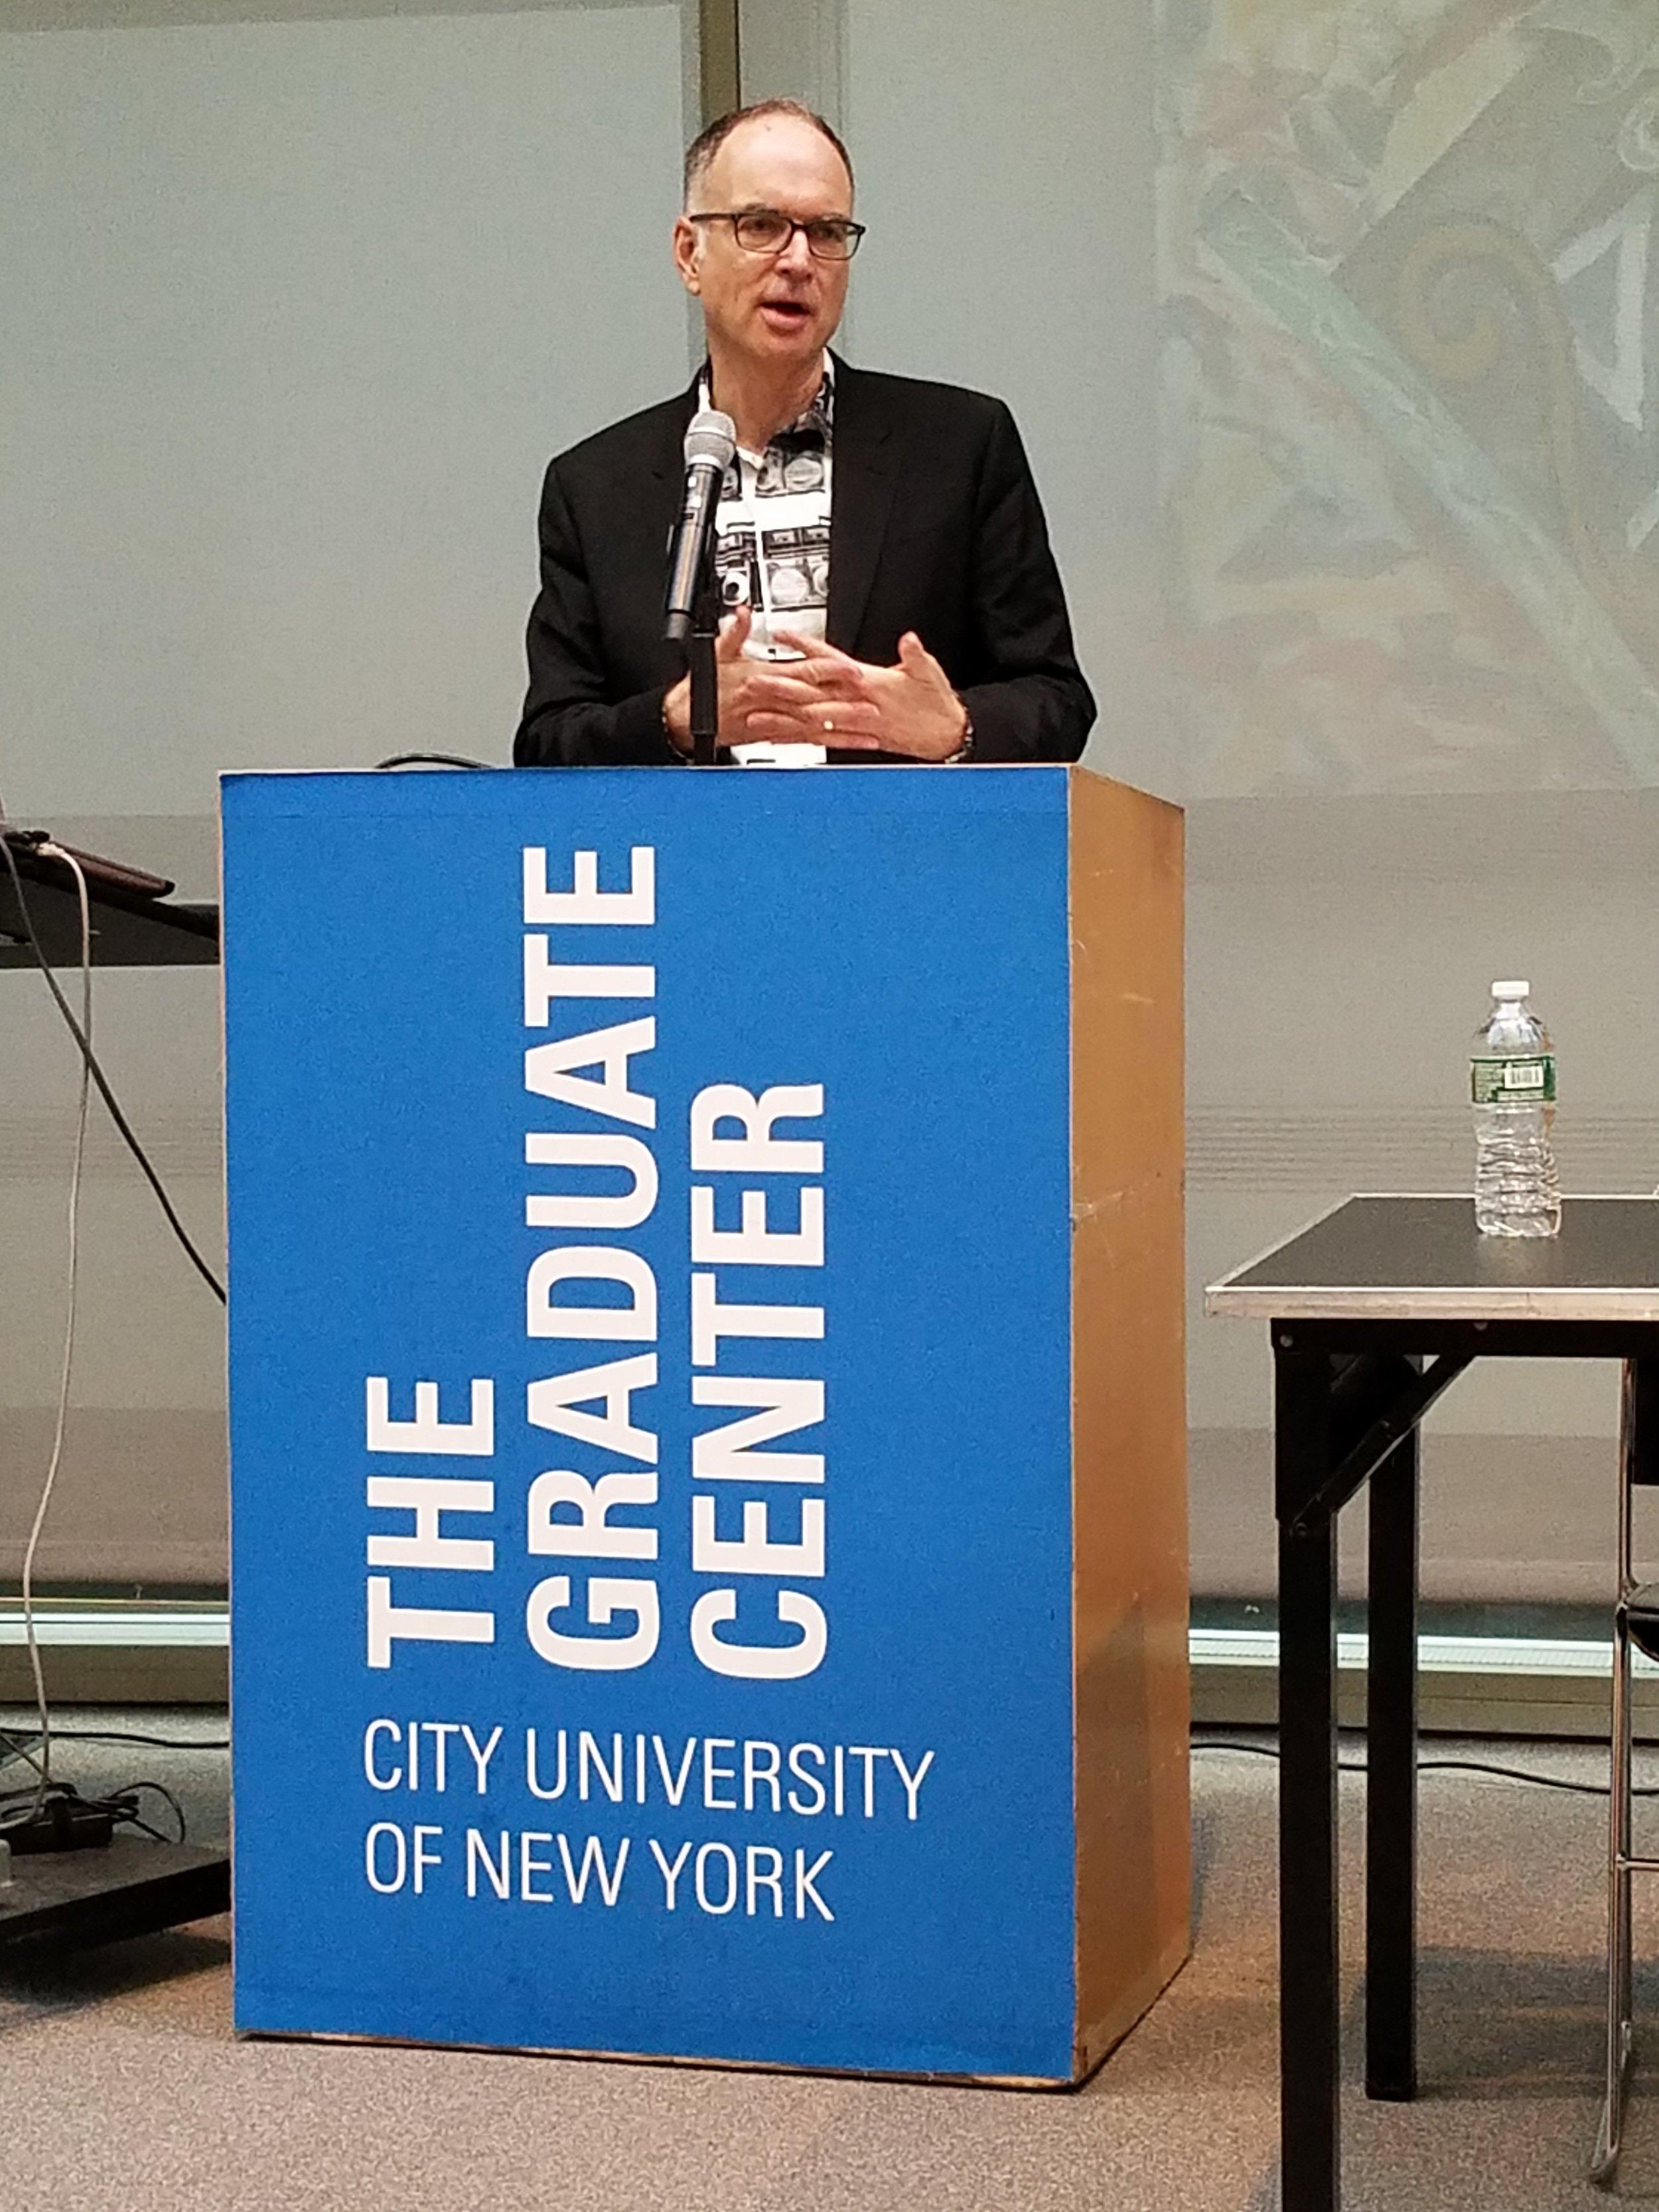 Ken Wissoker, Editorial Director, Duke University Press and Director of Intellectual Publics, The Graduate Center, City University of New York